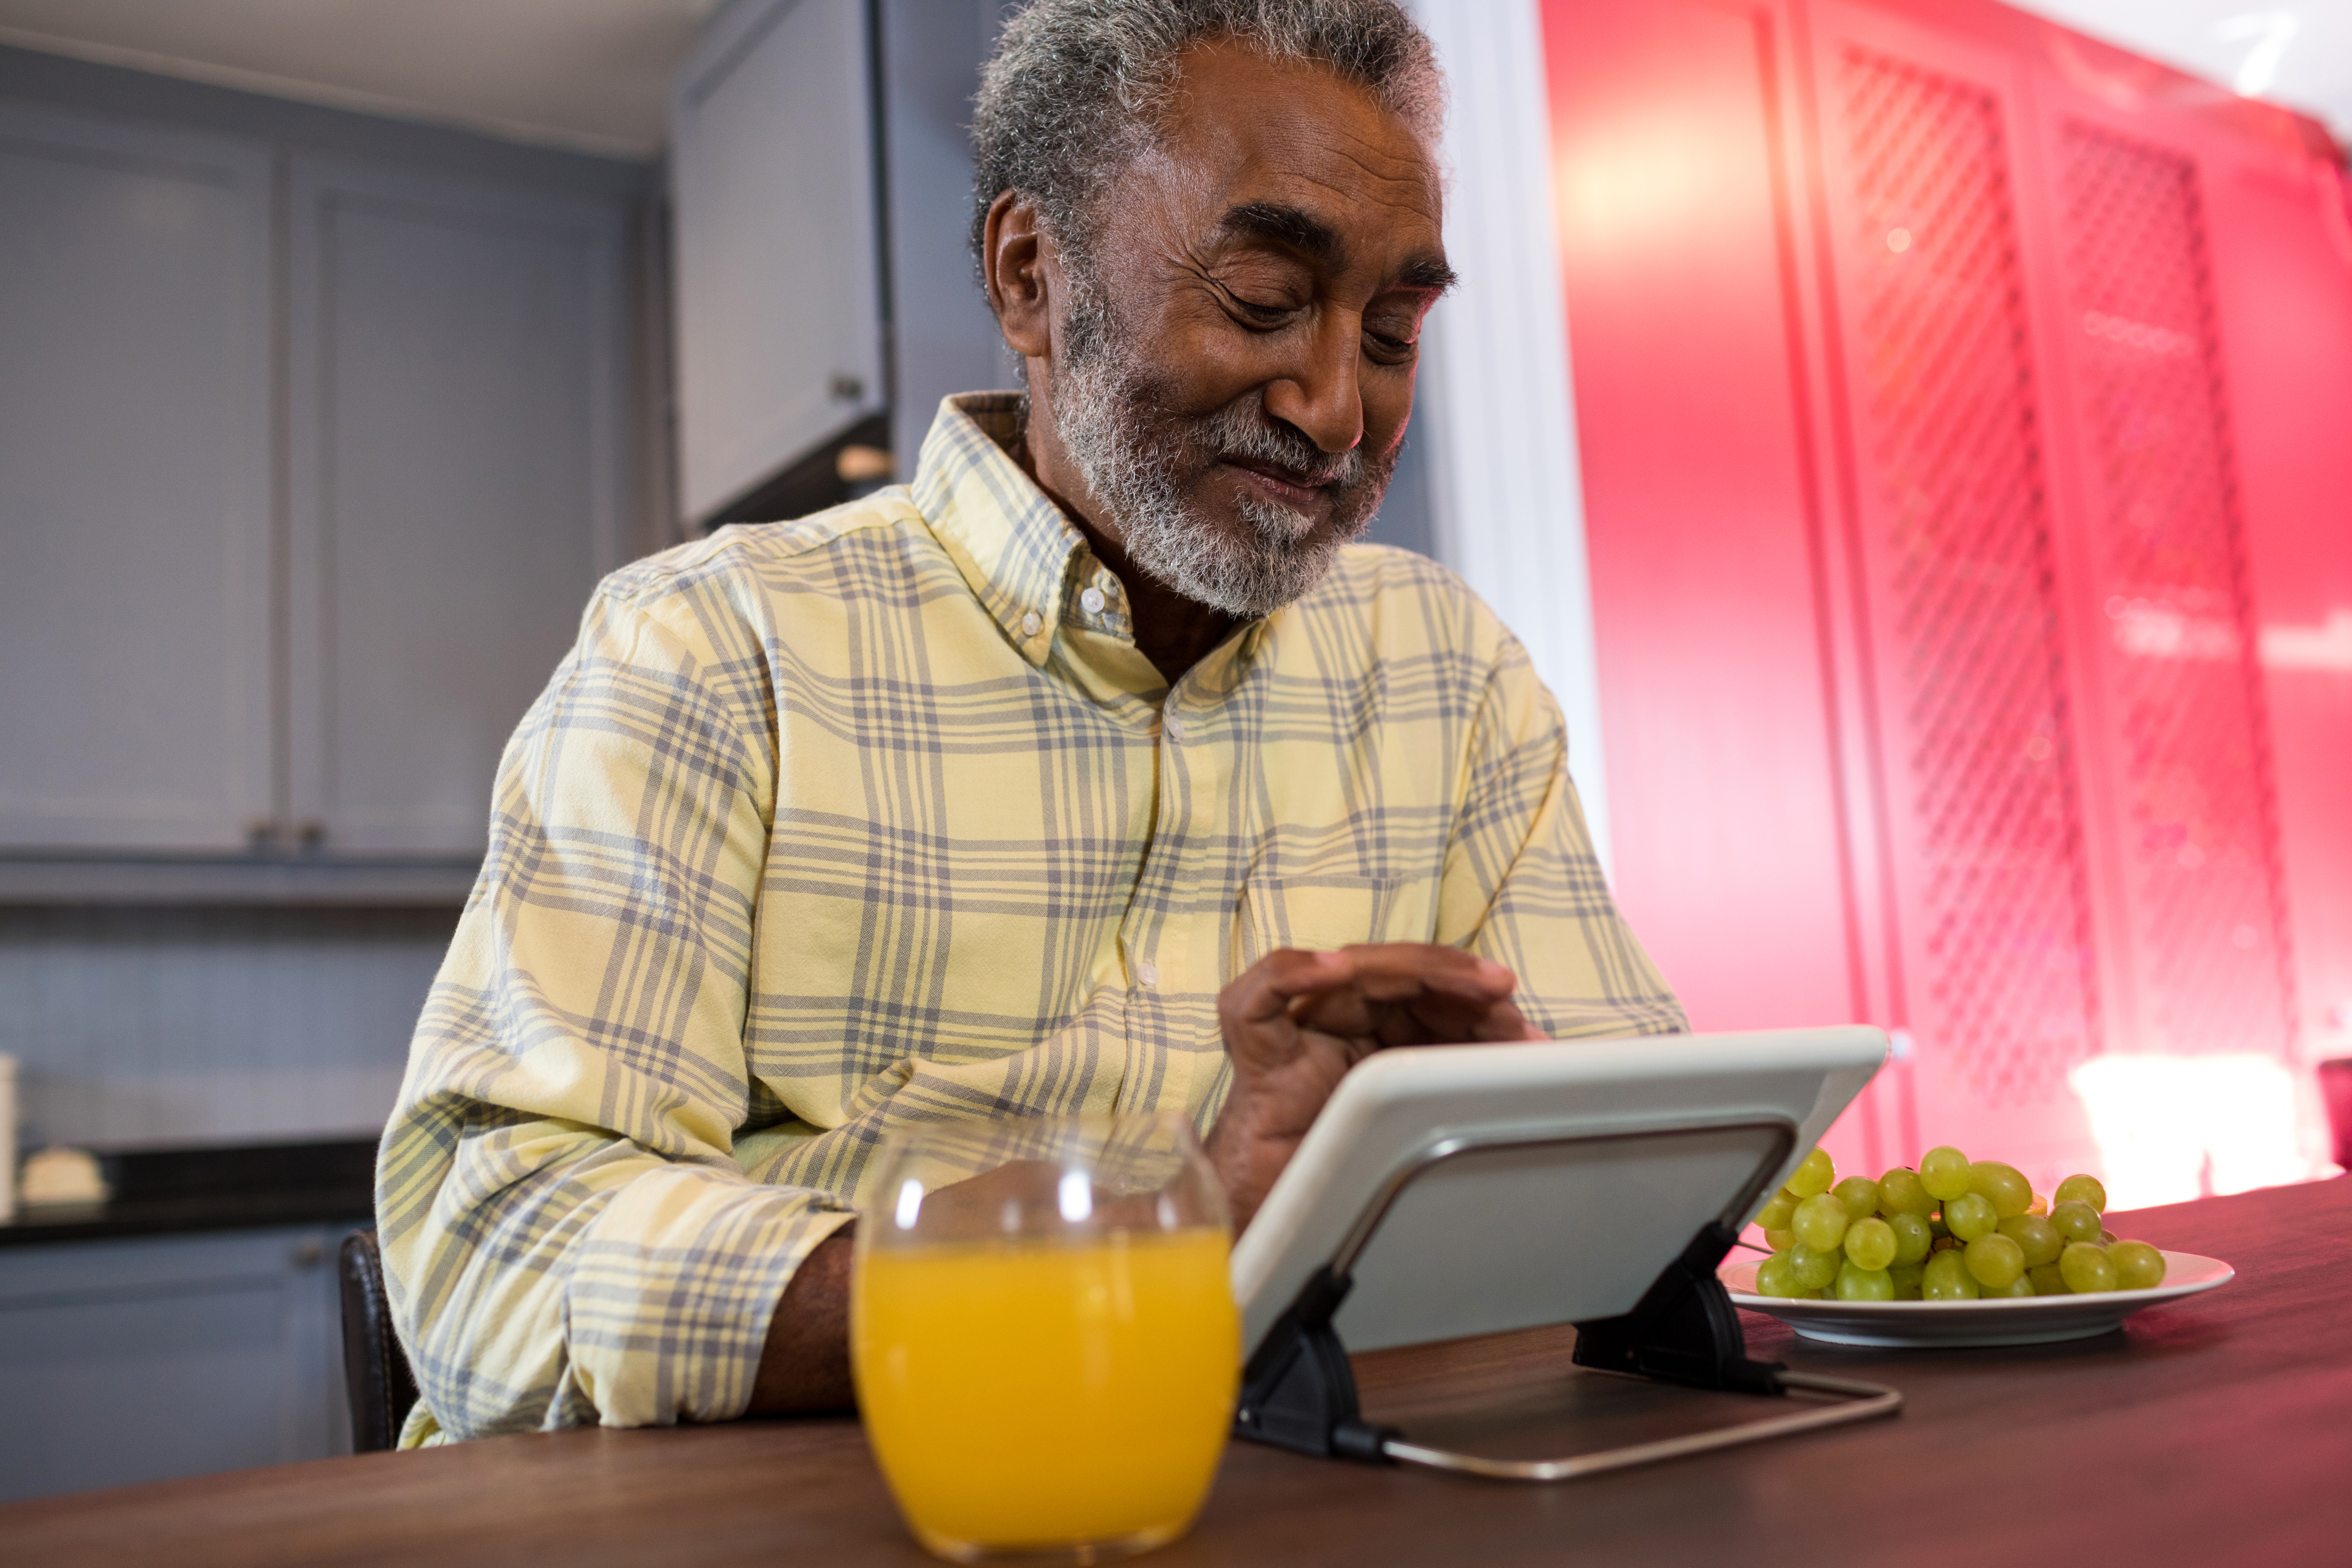 Happy senior man using tablet computer in kitchen